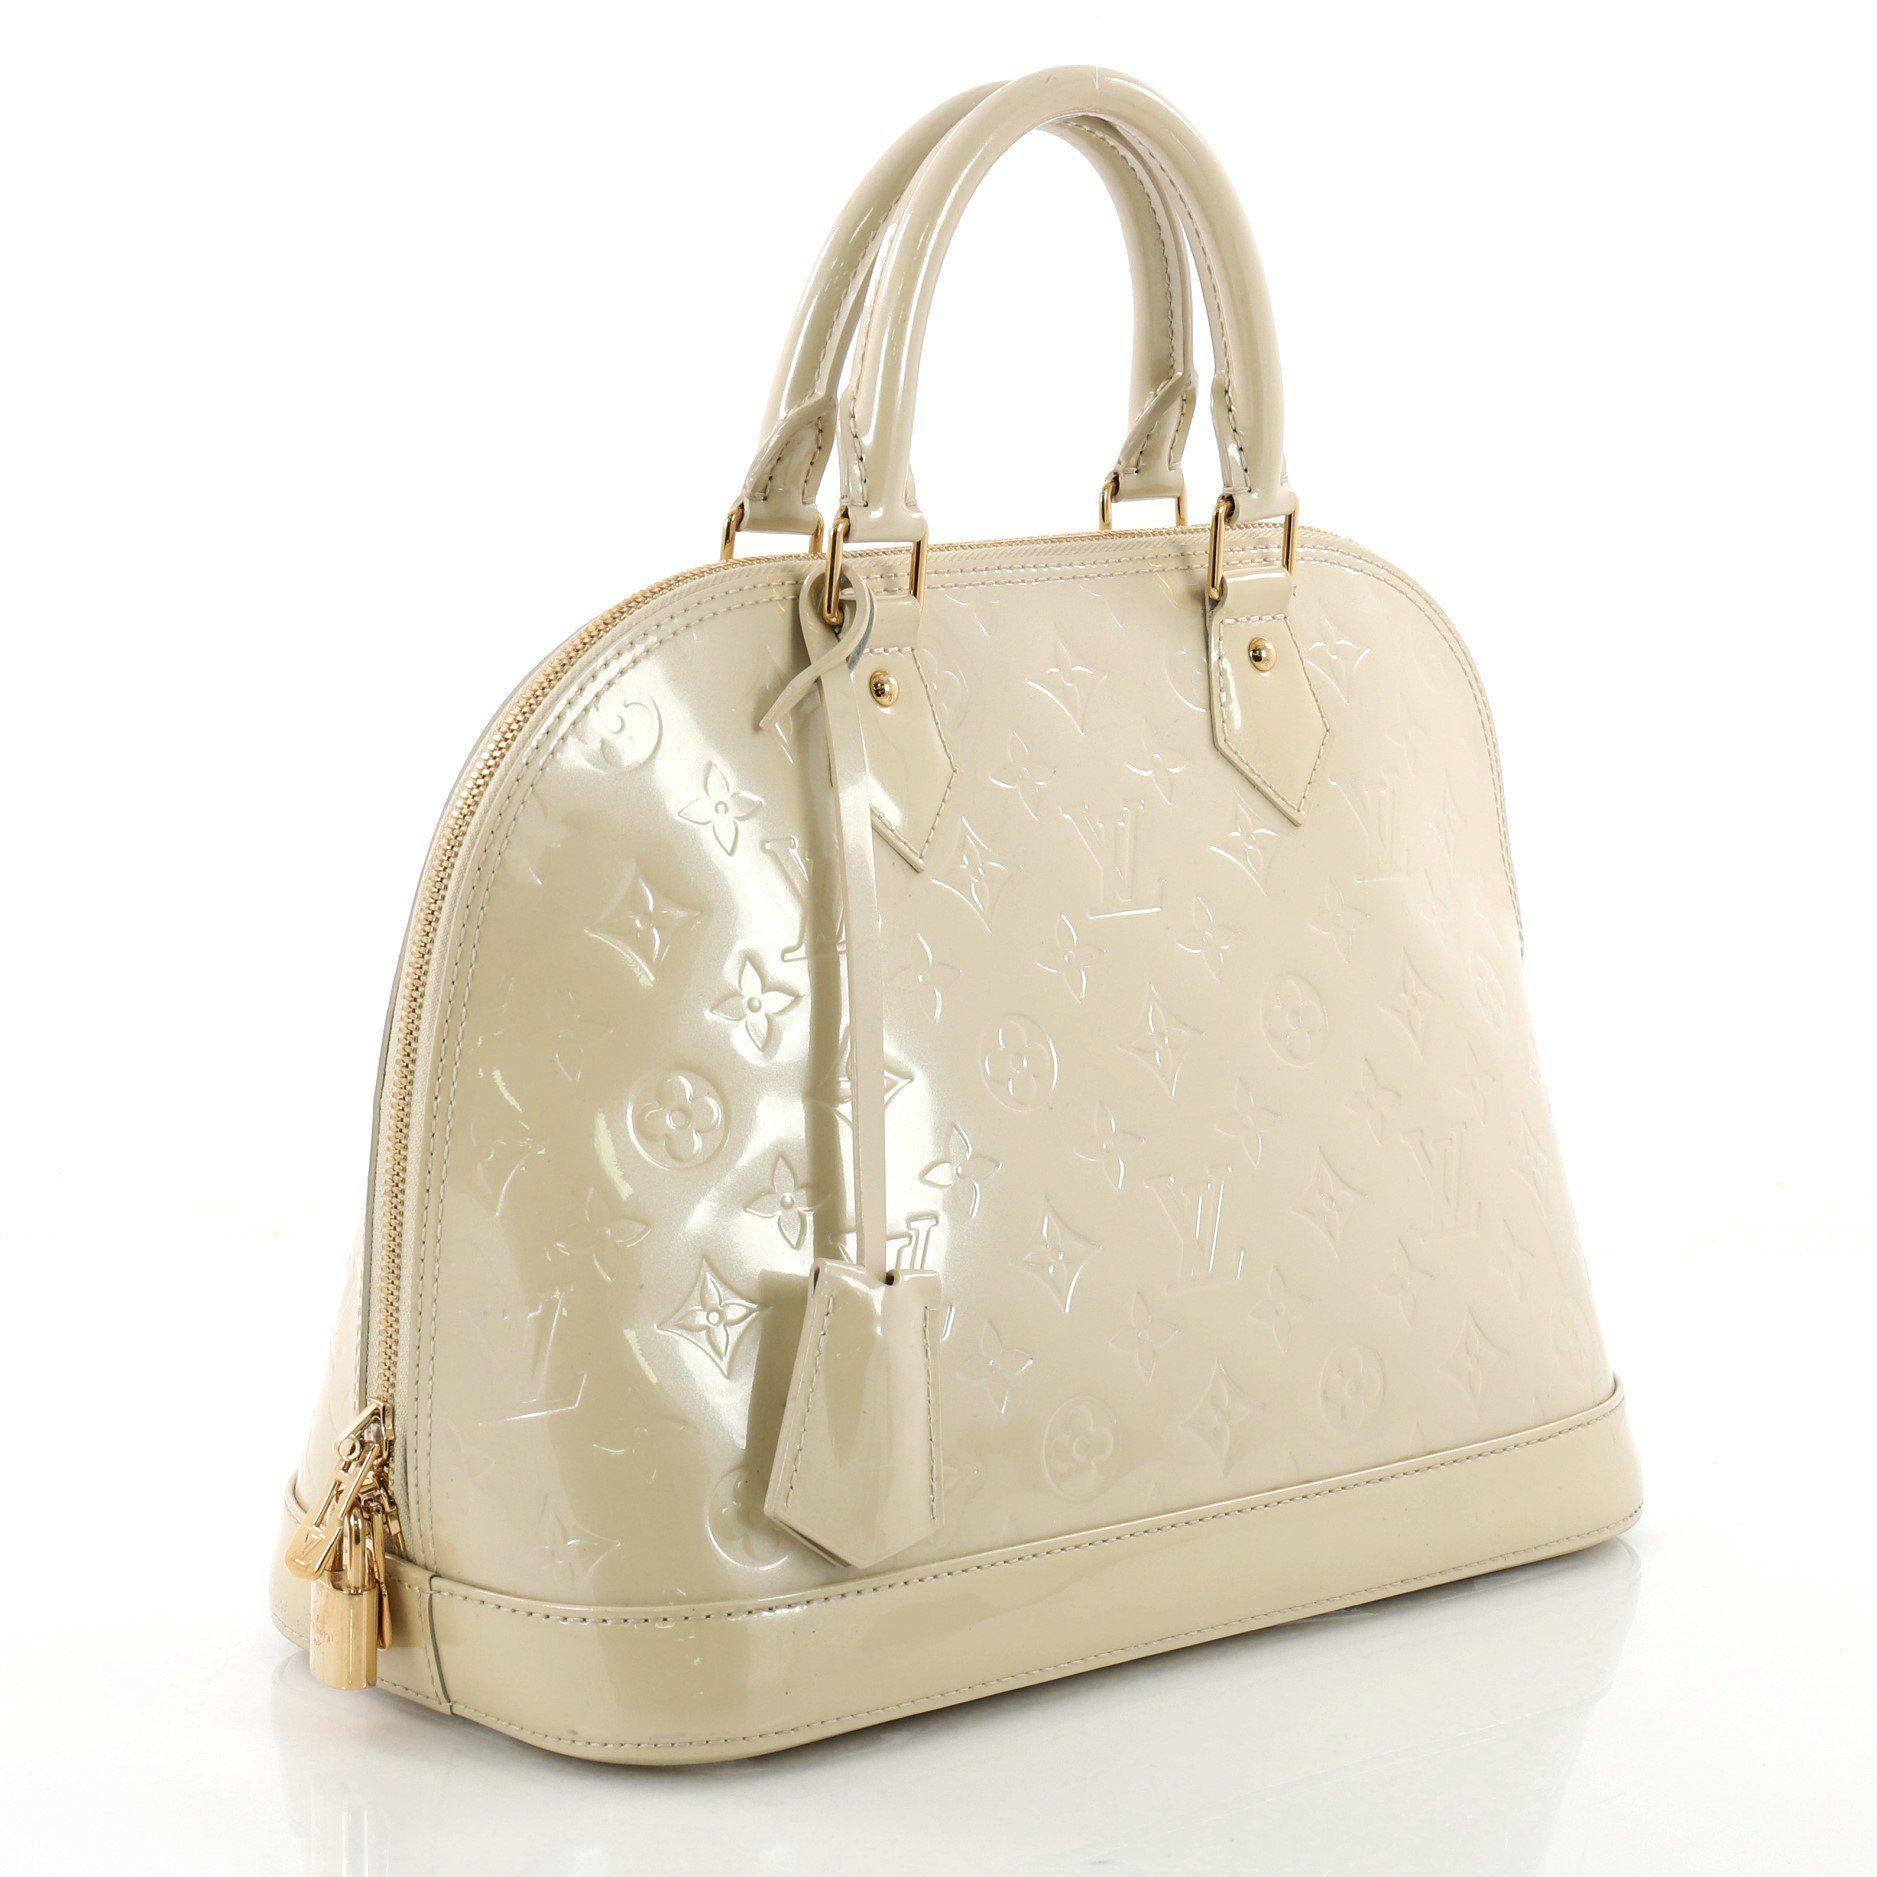 ccd2e51d8d9d Lyst - Louis Vuitton Pre Owned Alma Handbag Monogram Vernis Pm in ...